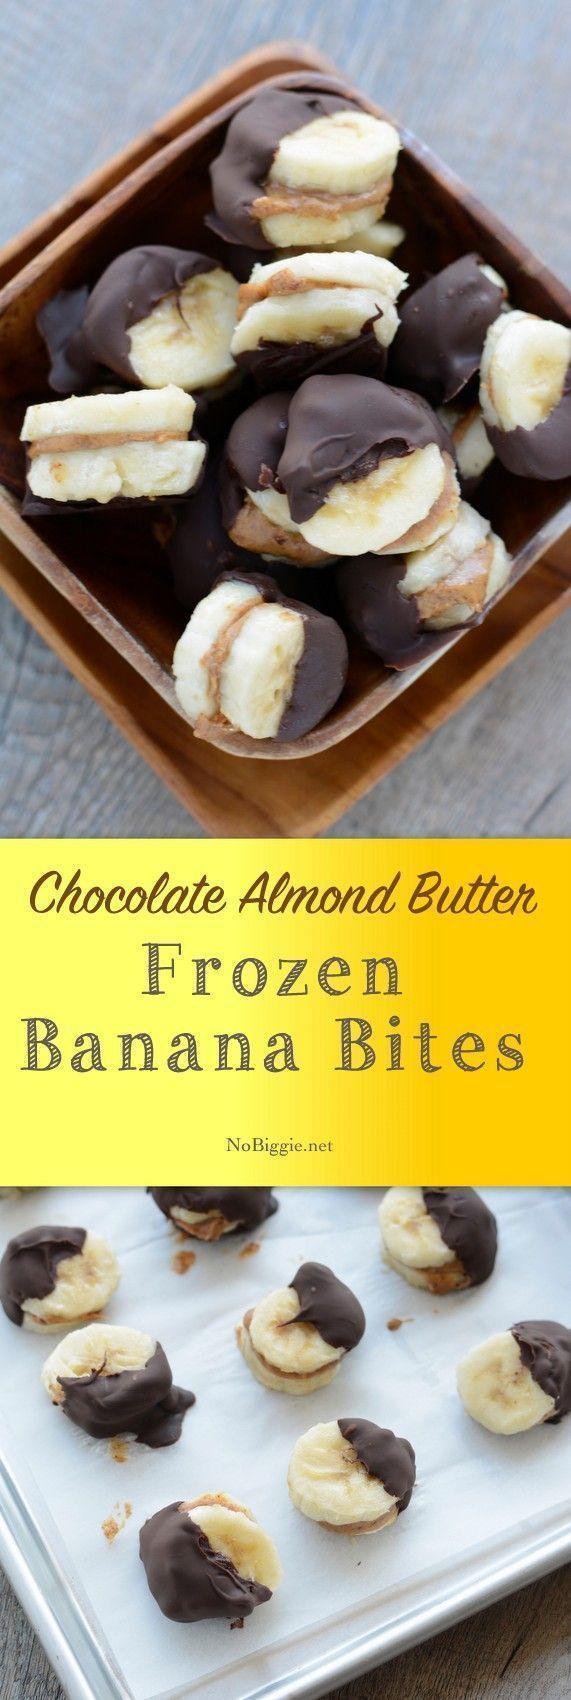 Frozen Banana Bites #healthyeating